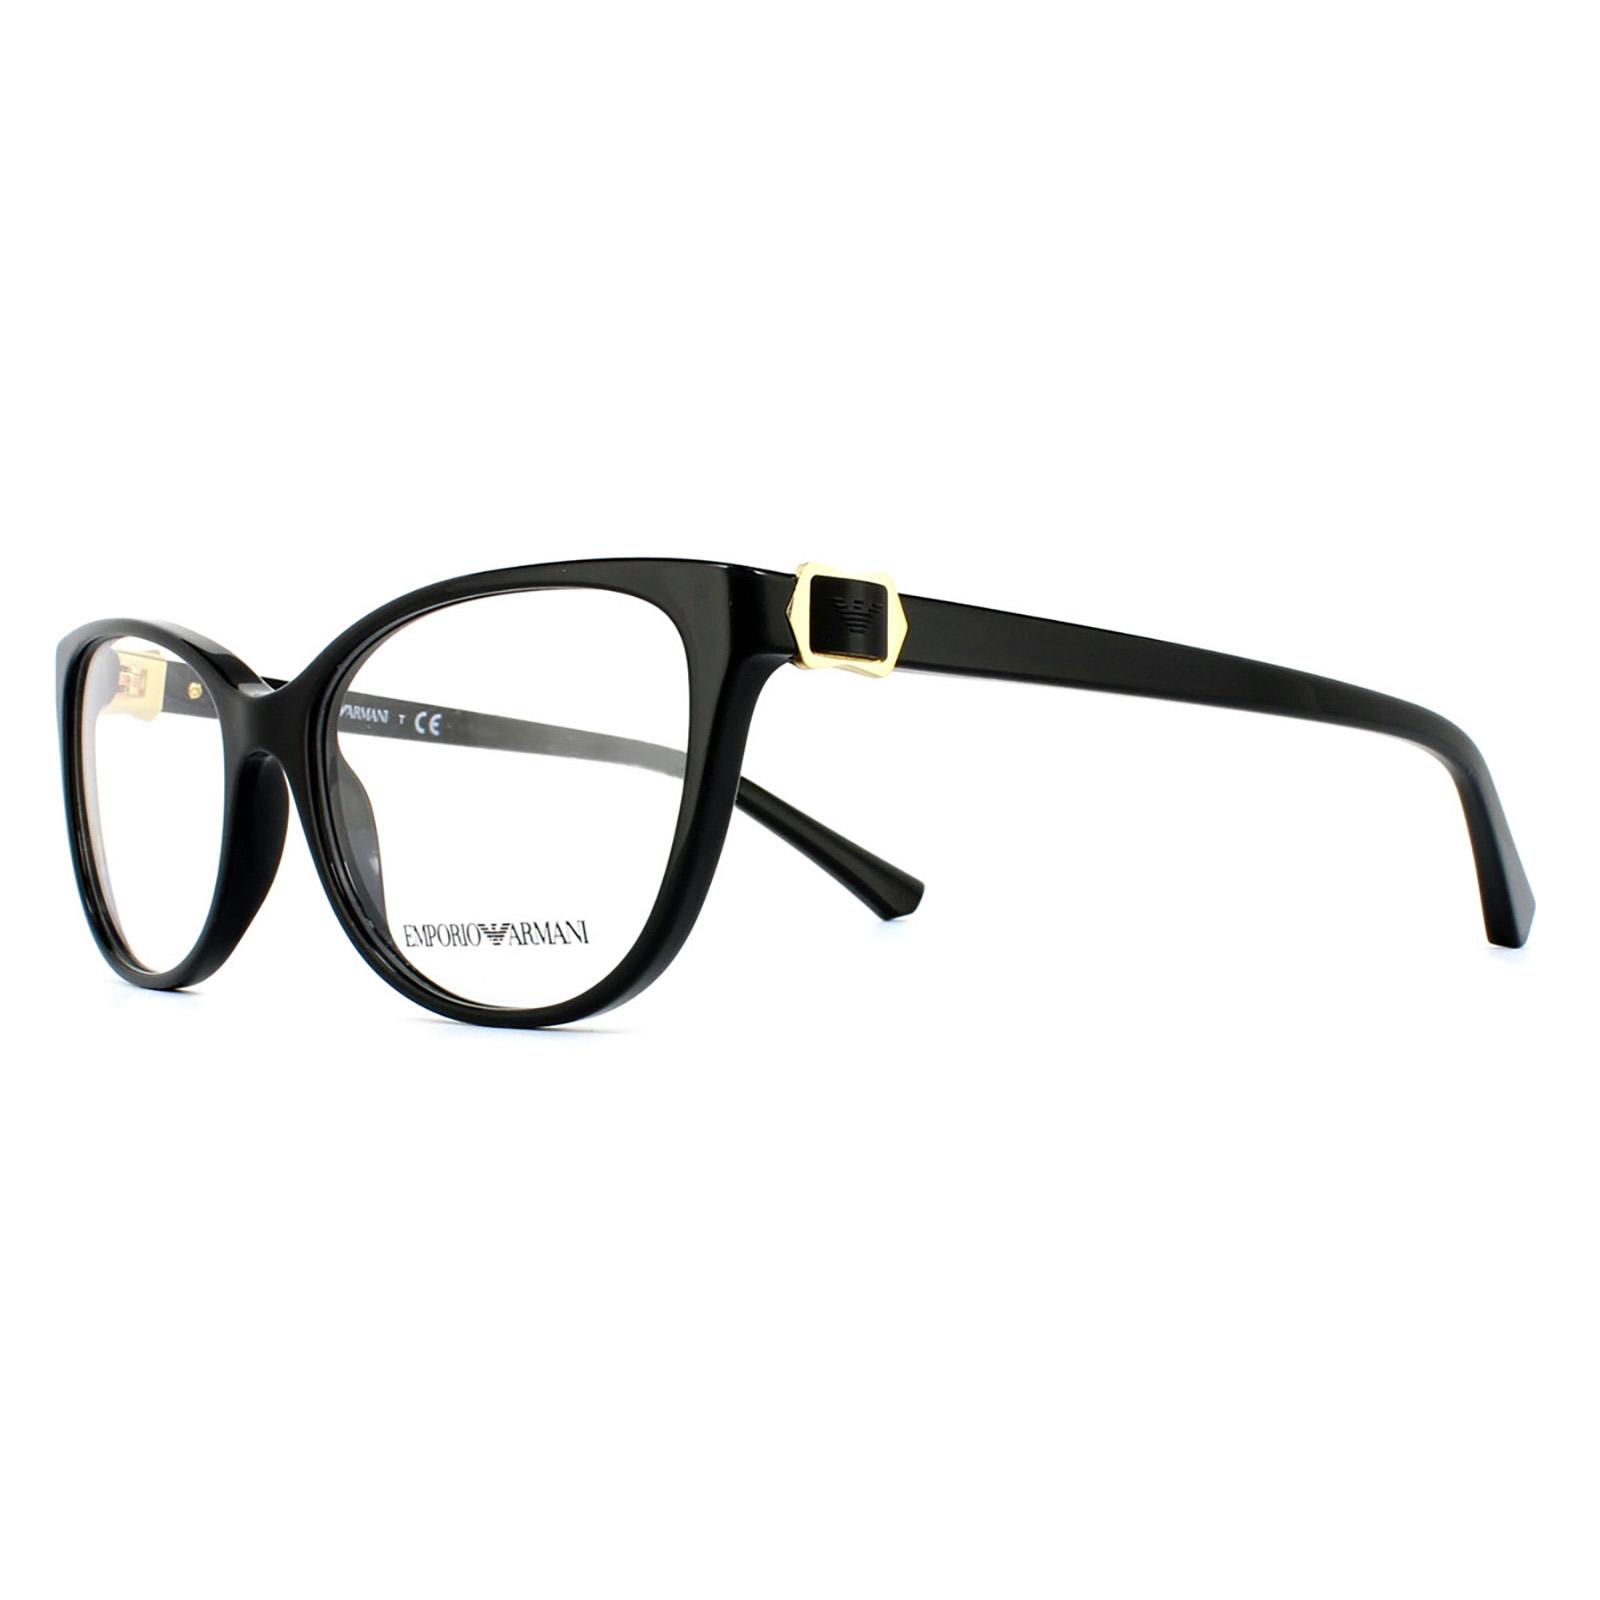 e45b74c56d0 Armani Frames For Glasses